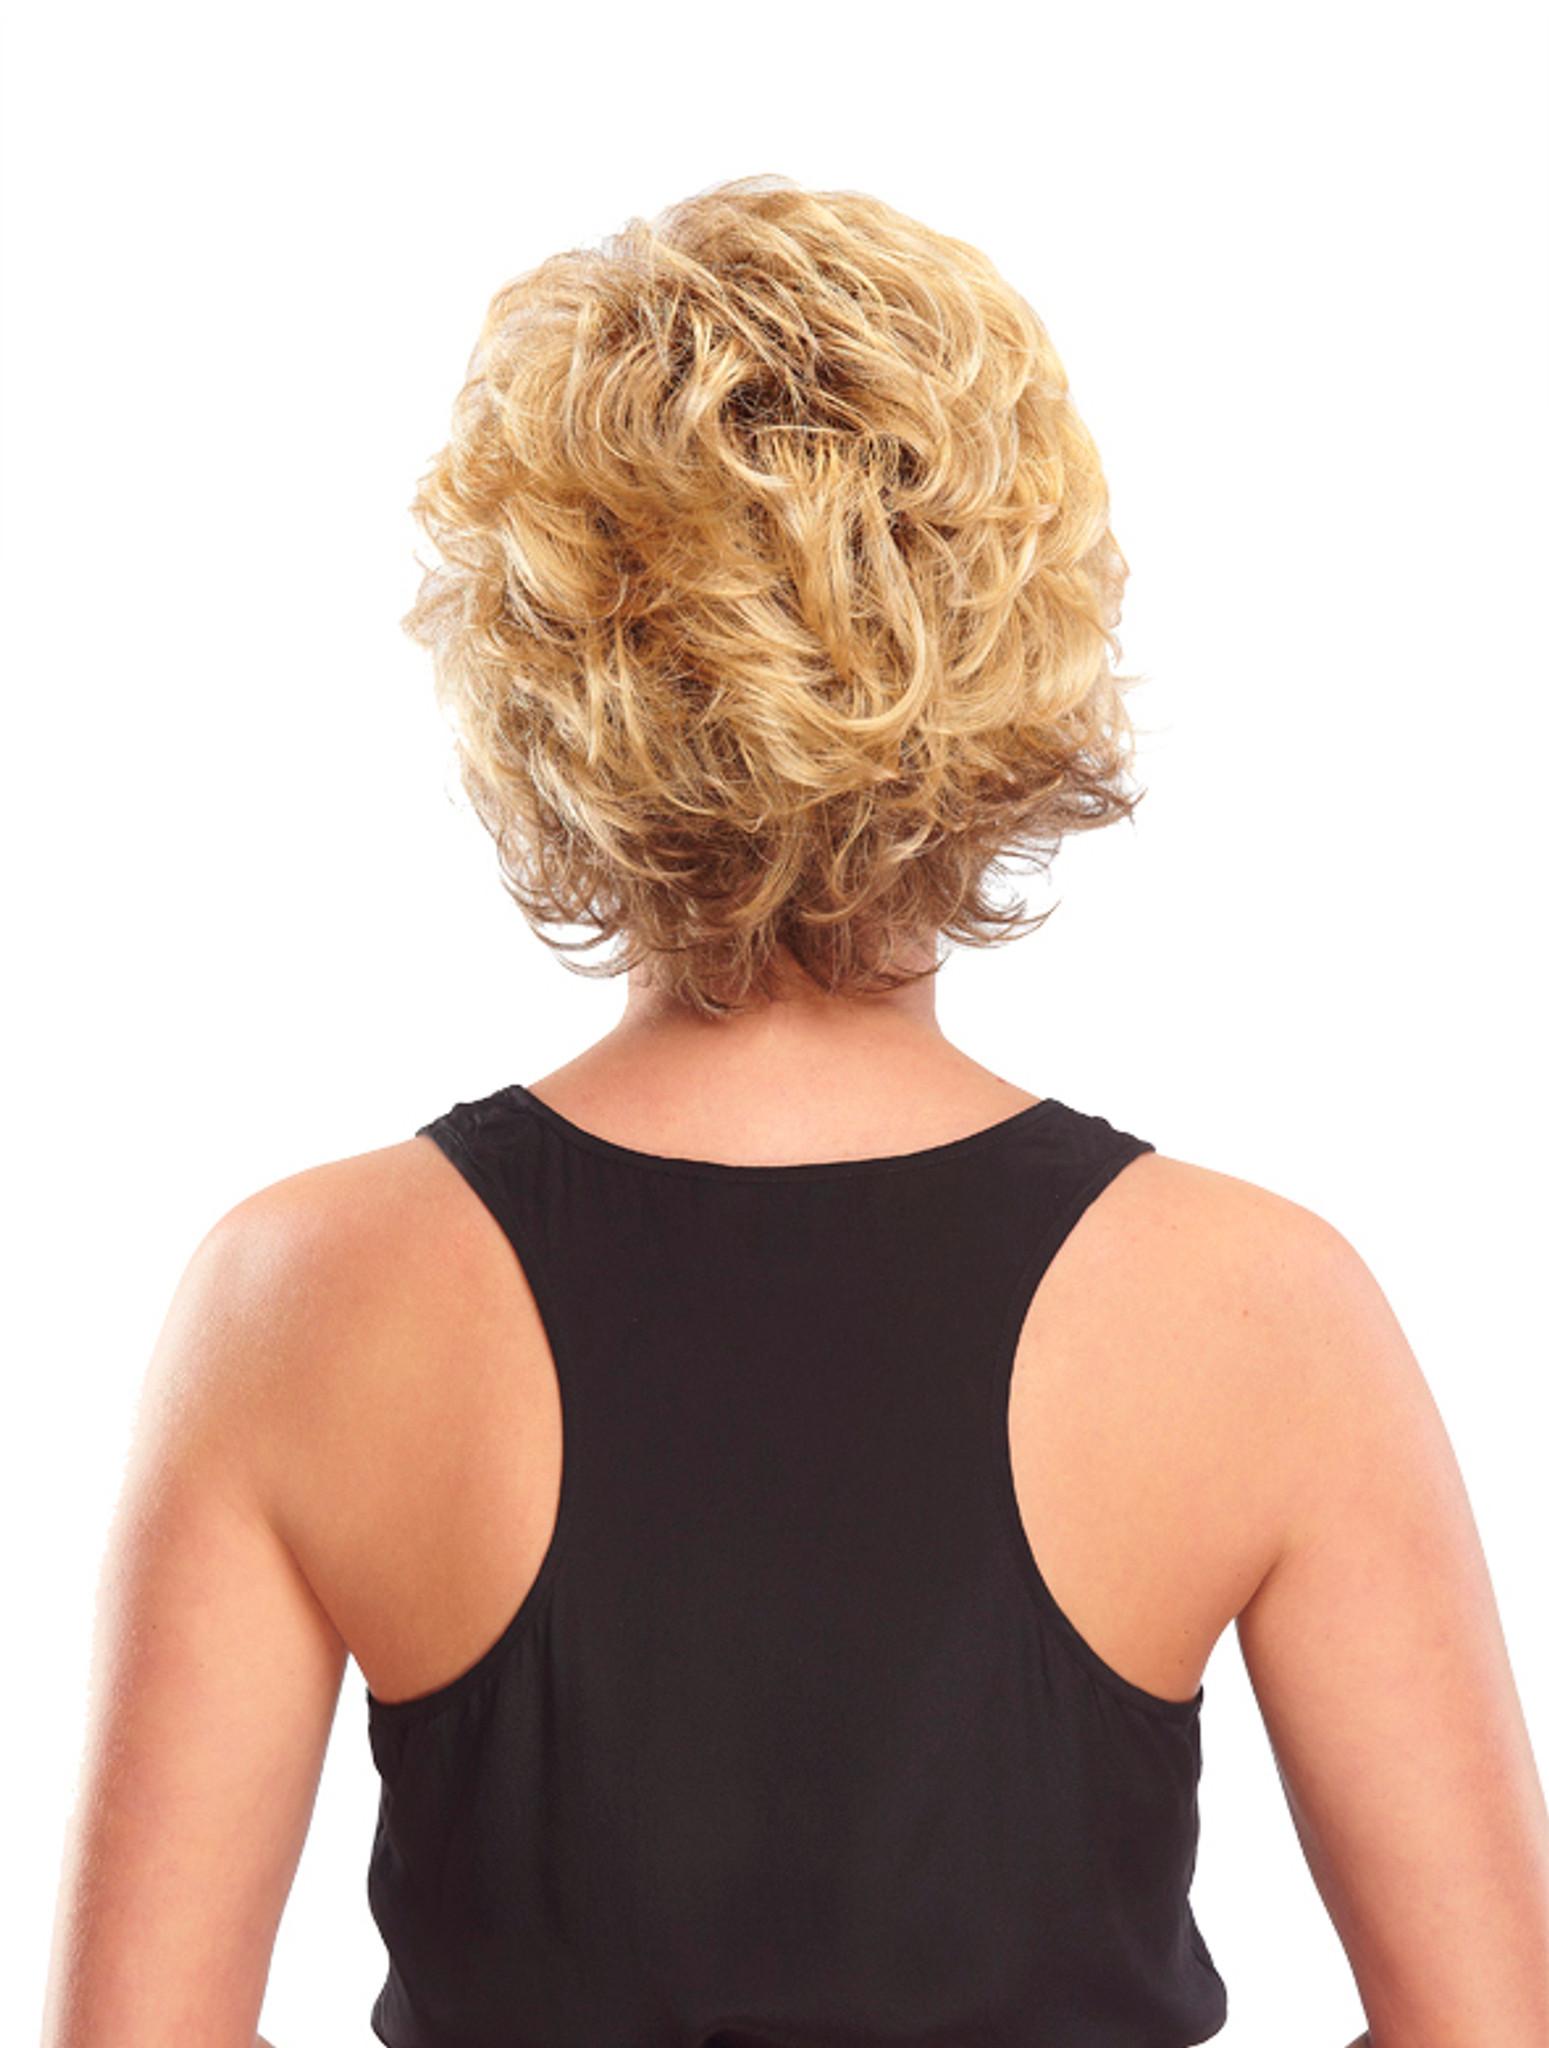 Jon Renau Bianca Synthetic classic cap wig back view